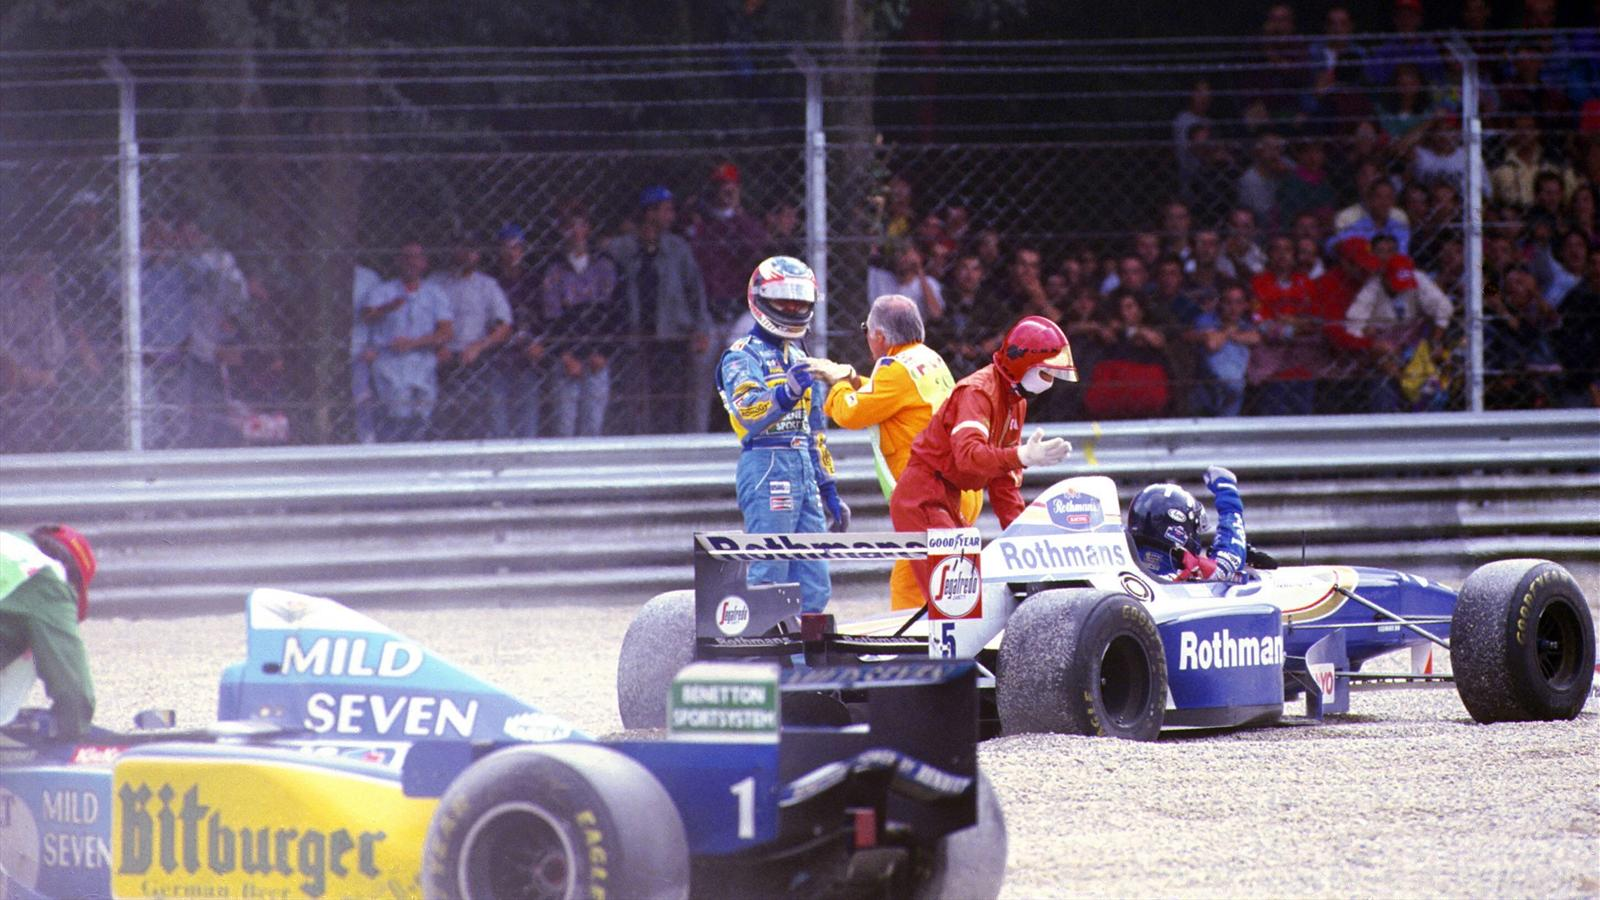 Michael Schumacher (Benetton) et Damon Hill (Williams) au Grand Prix d'Italie 1995